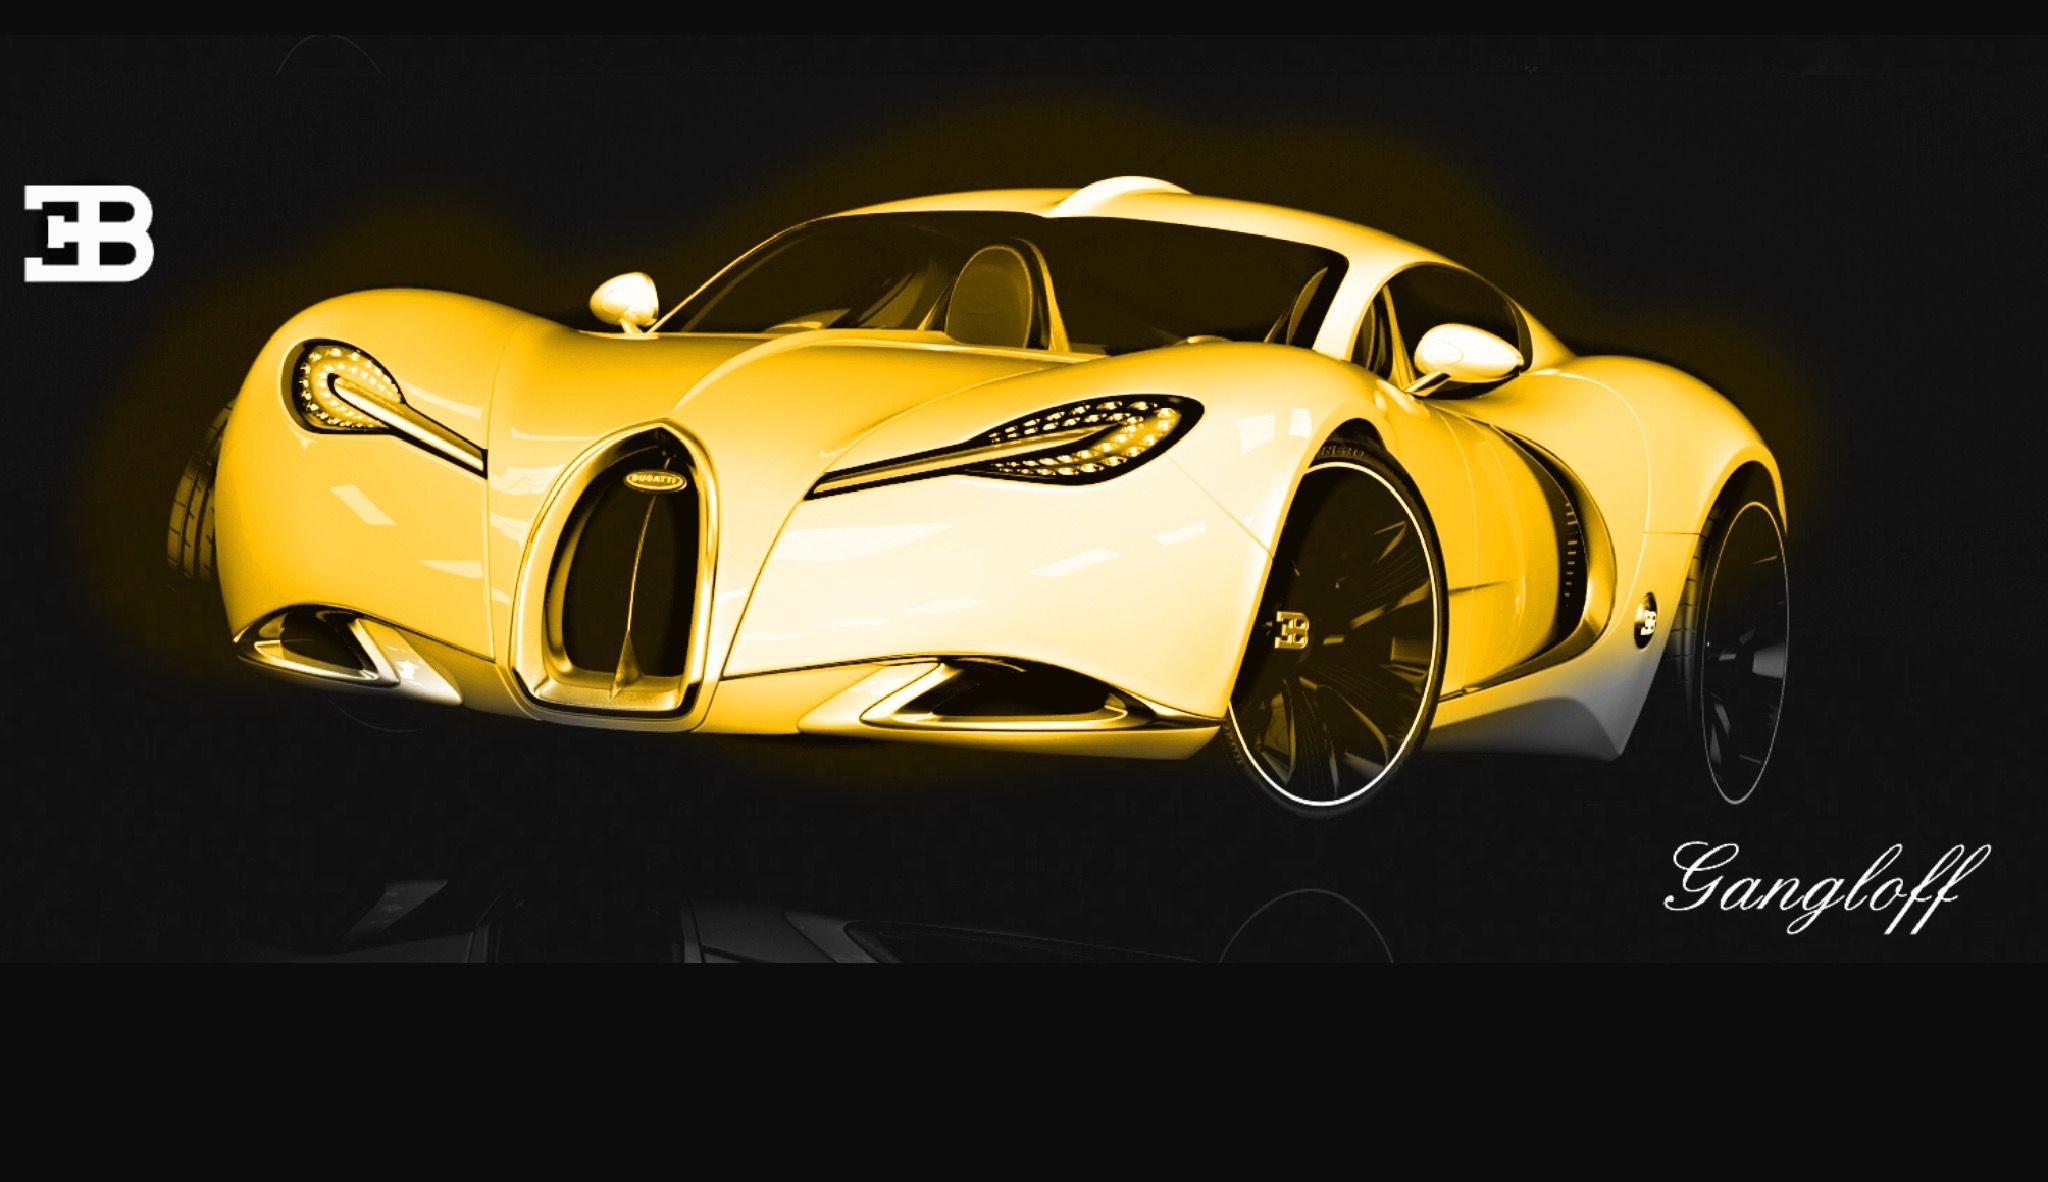 Bugatti gangloff concept bugatti sports car vehicles